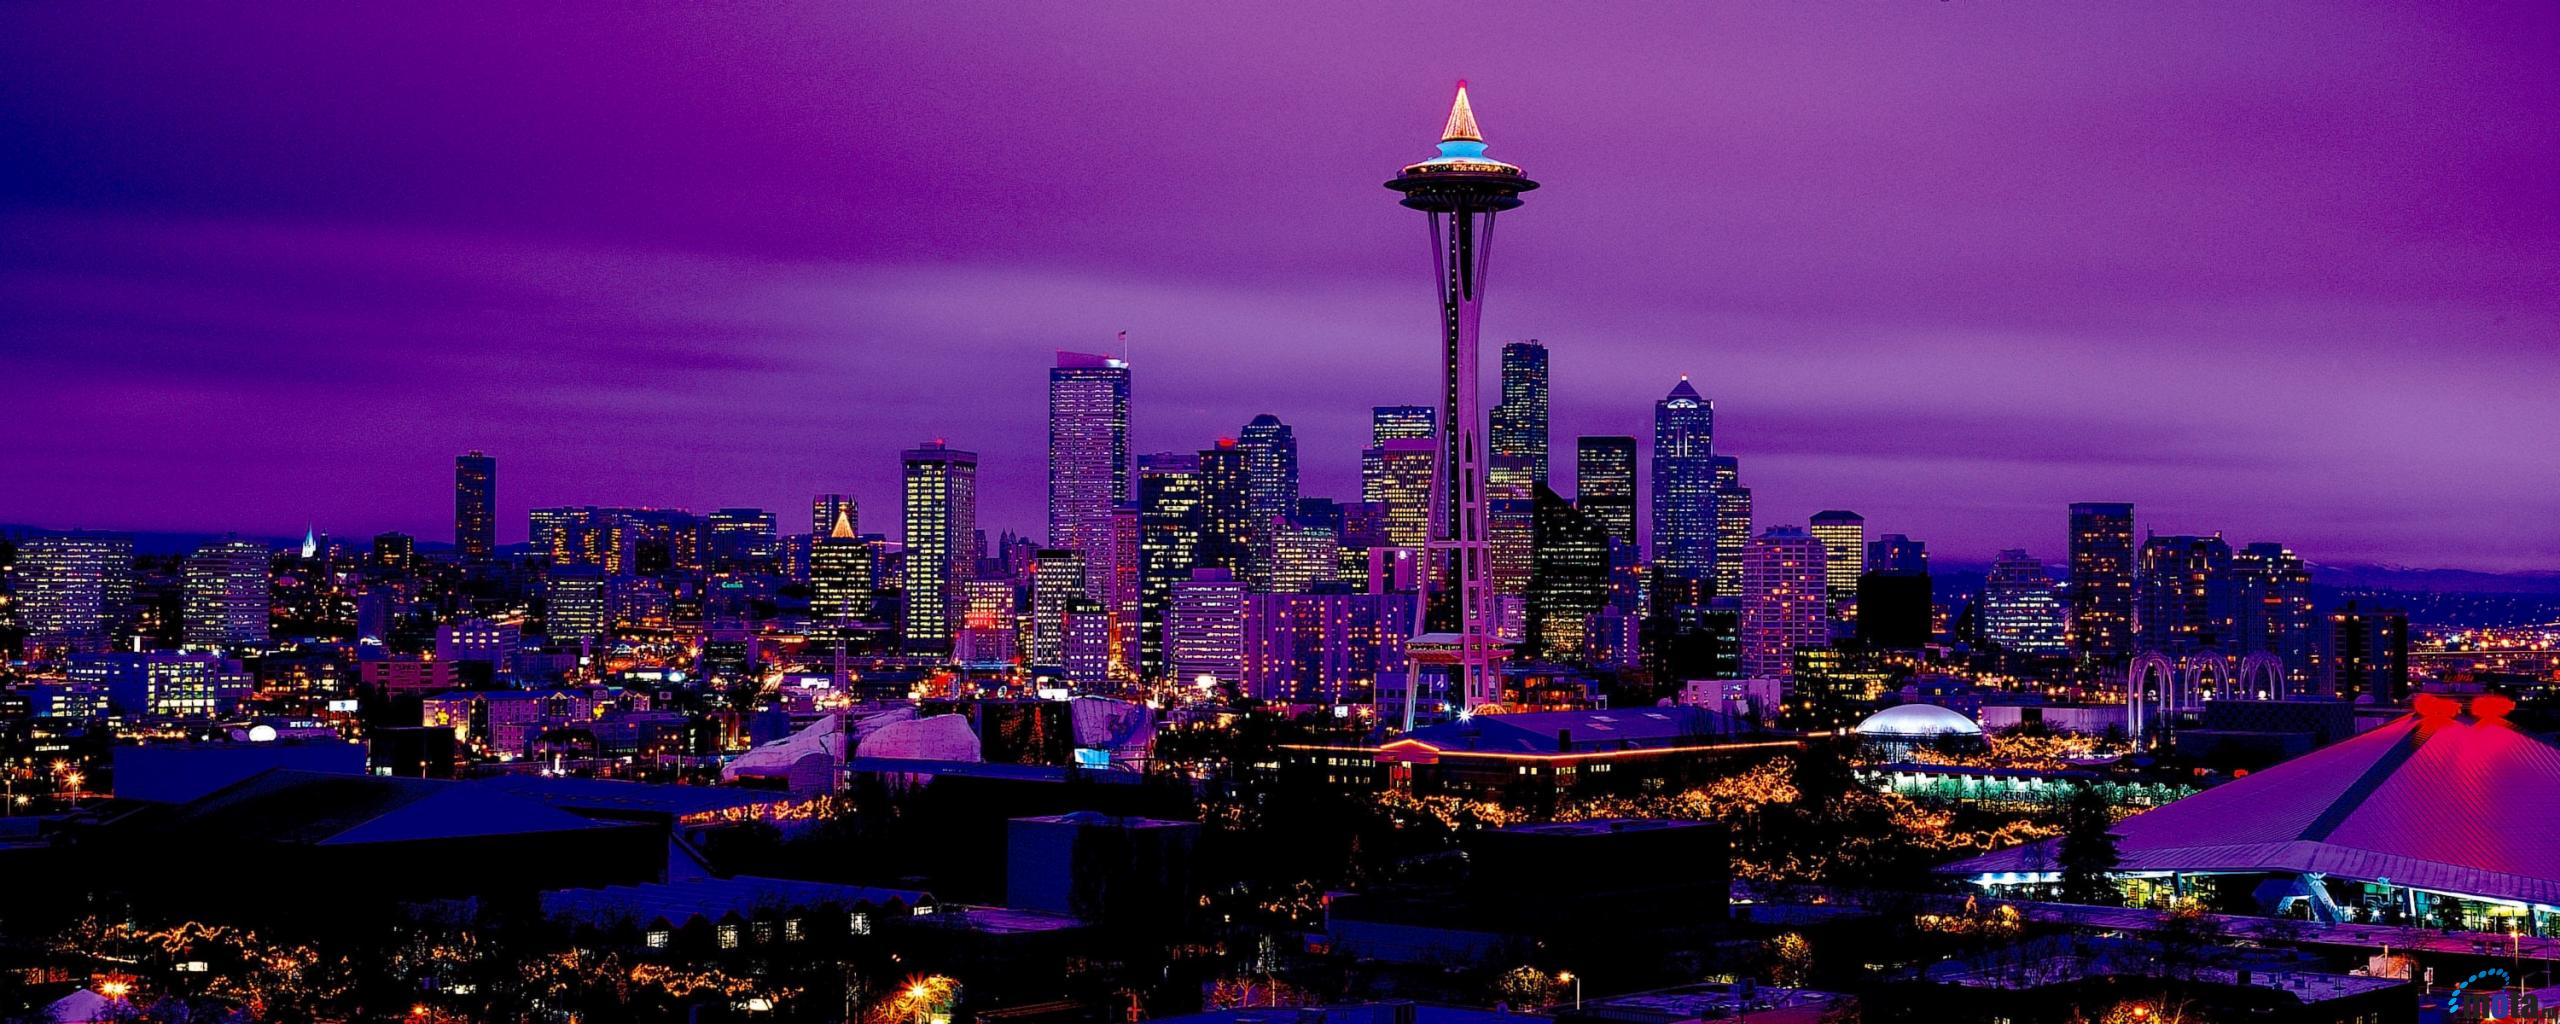 Wallpaper Seattle by night Washington USA 2560 x 1024 Dual Monitor 2560x1024